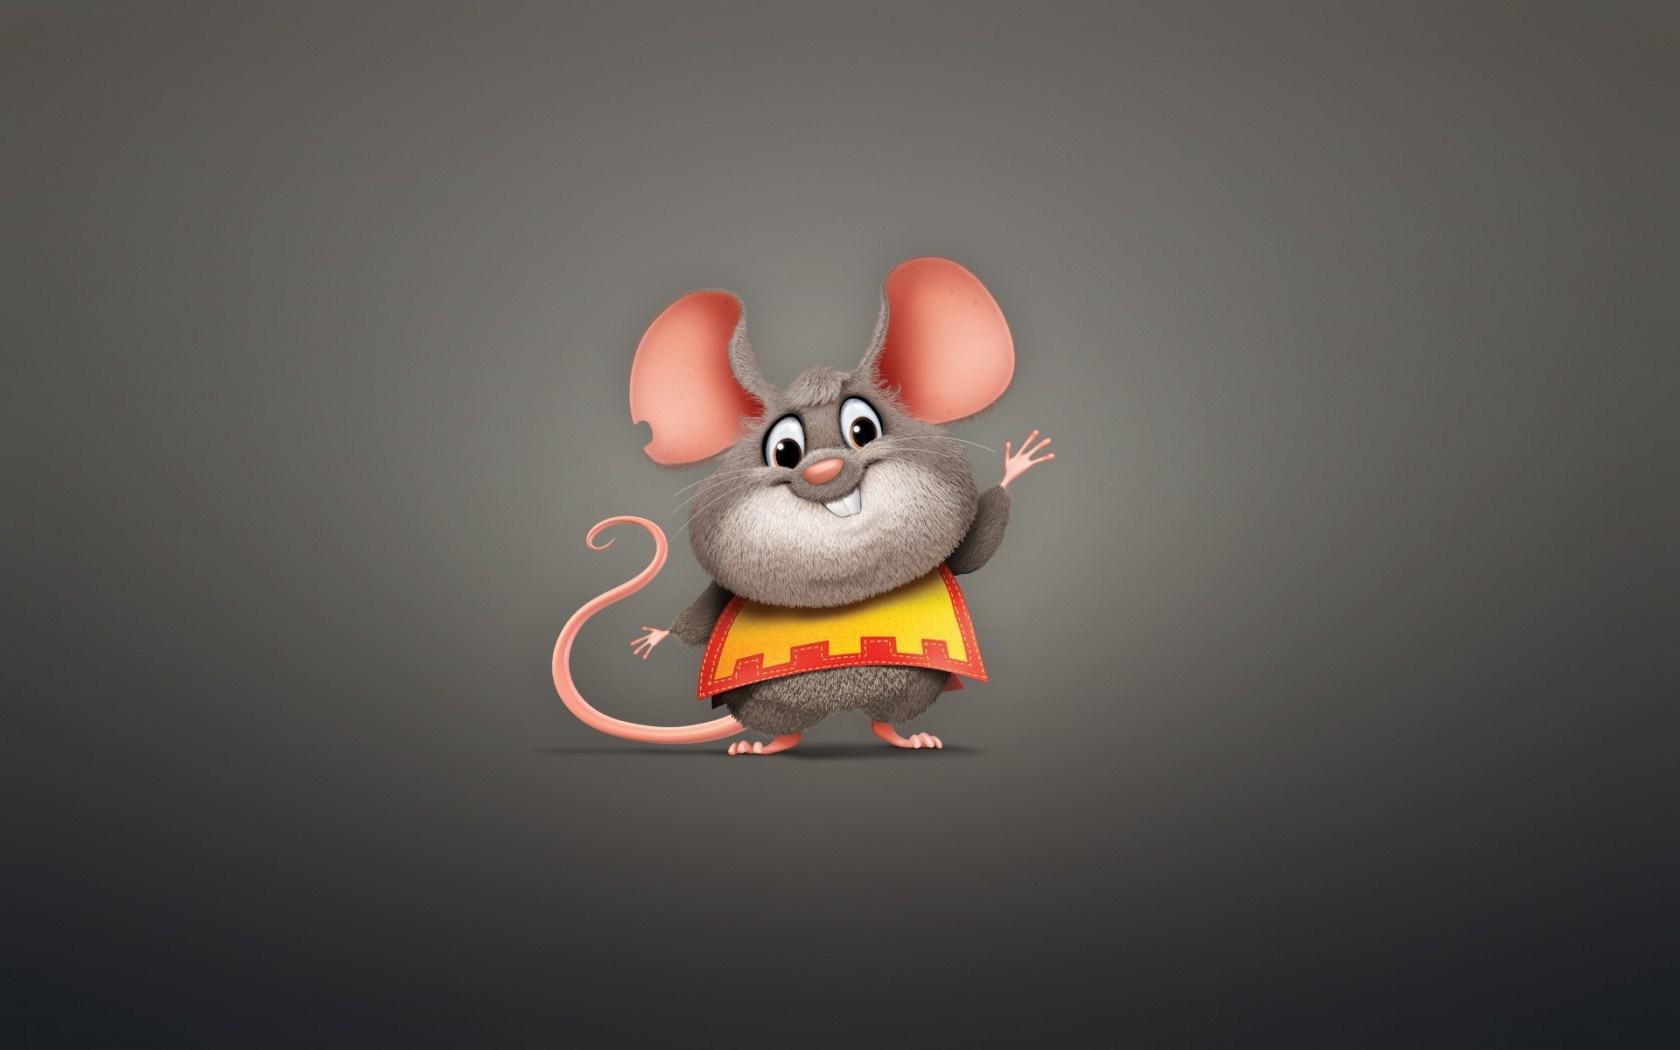 Mouse Rodent Animal Plump Minimalism Cartoon